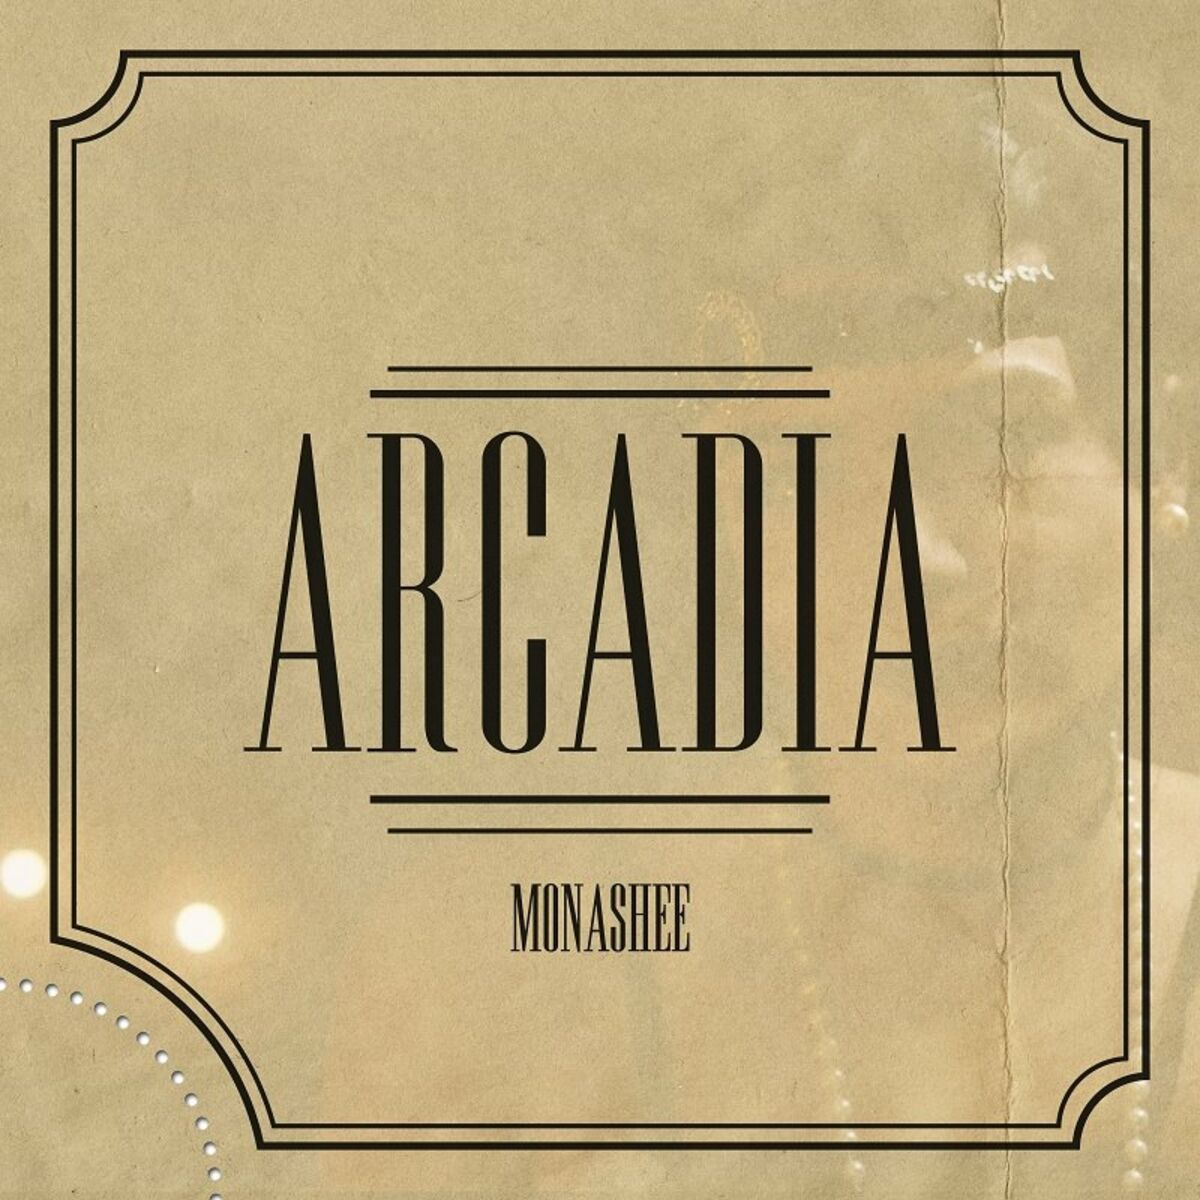 Monashee - Arcadia [single] (2021)